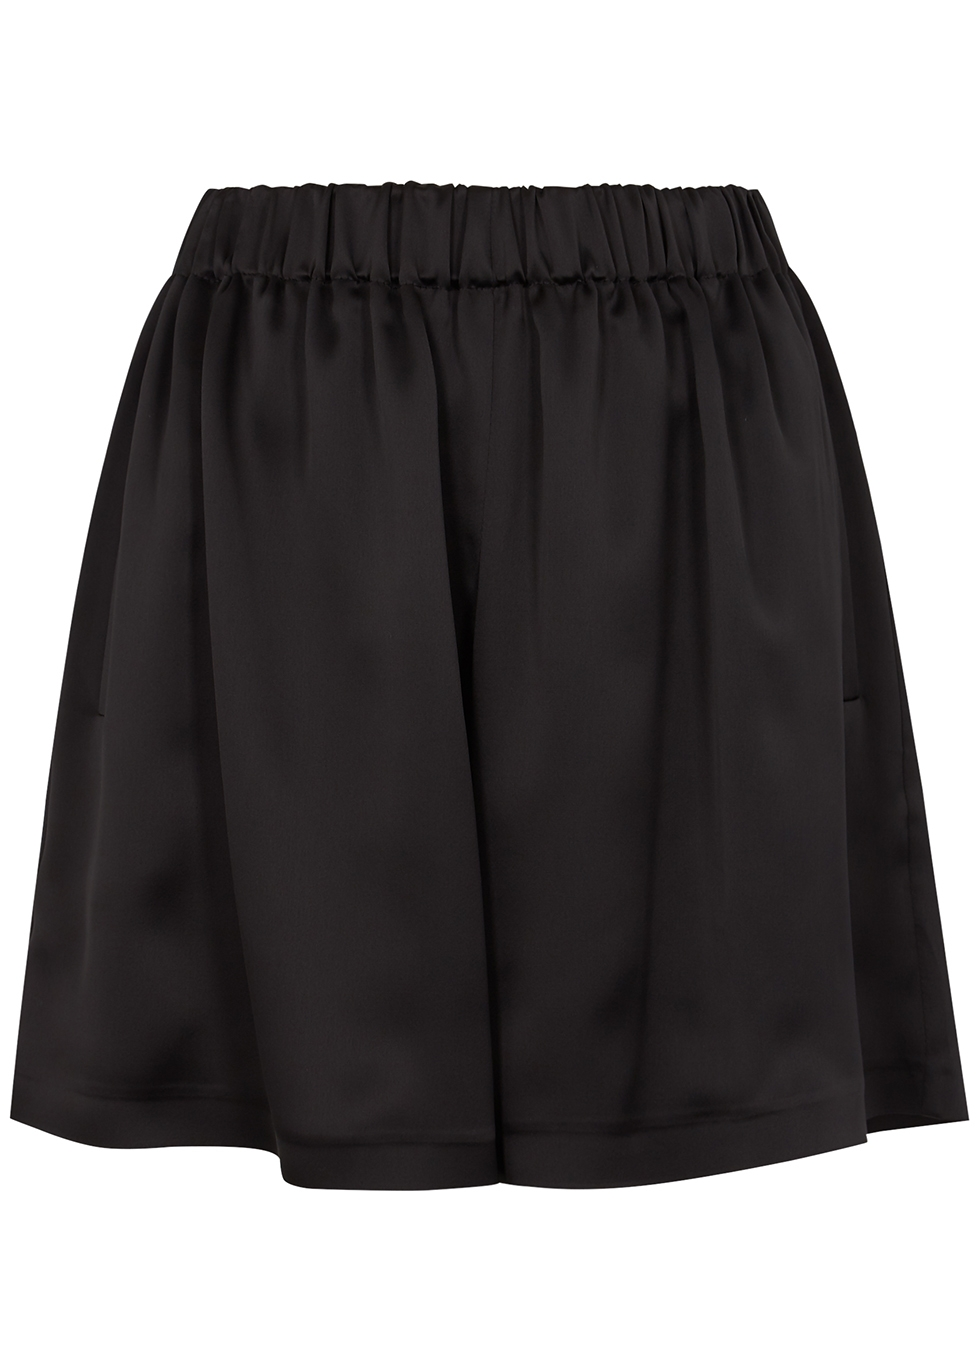 Rohmer black satin shorts